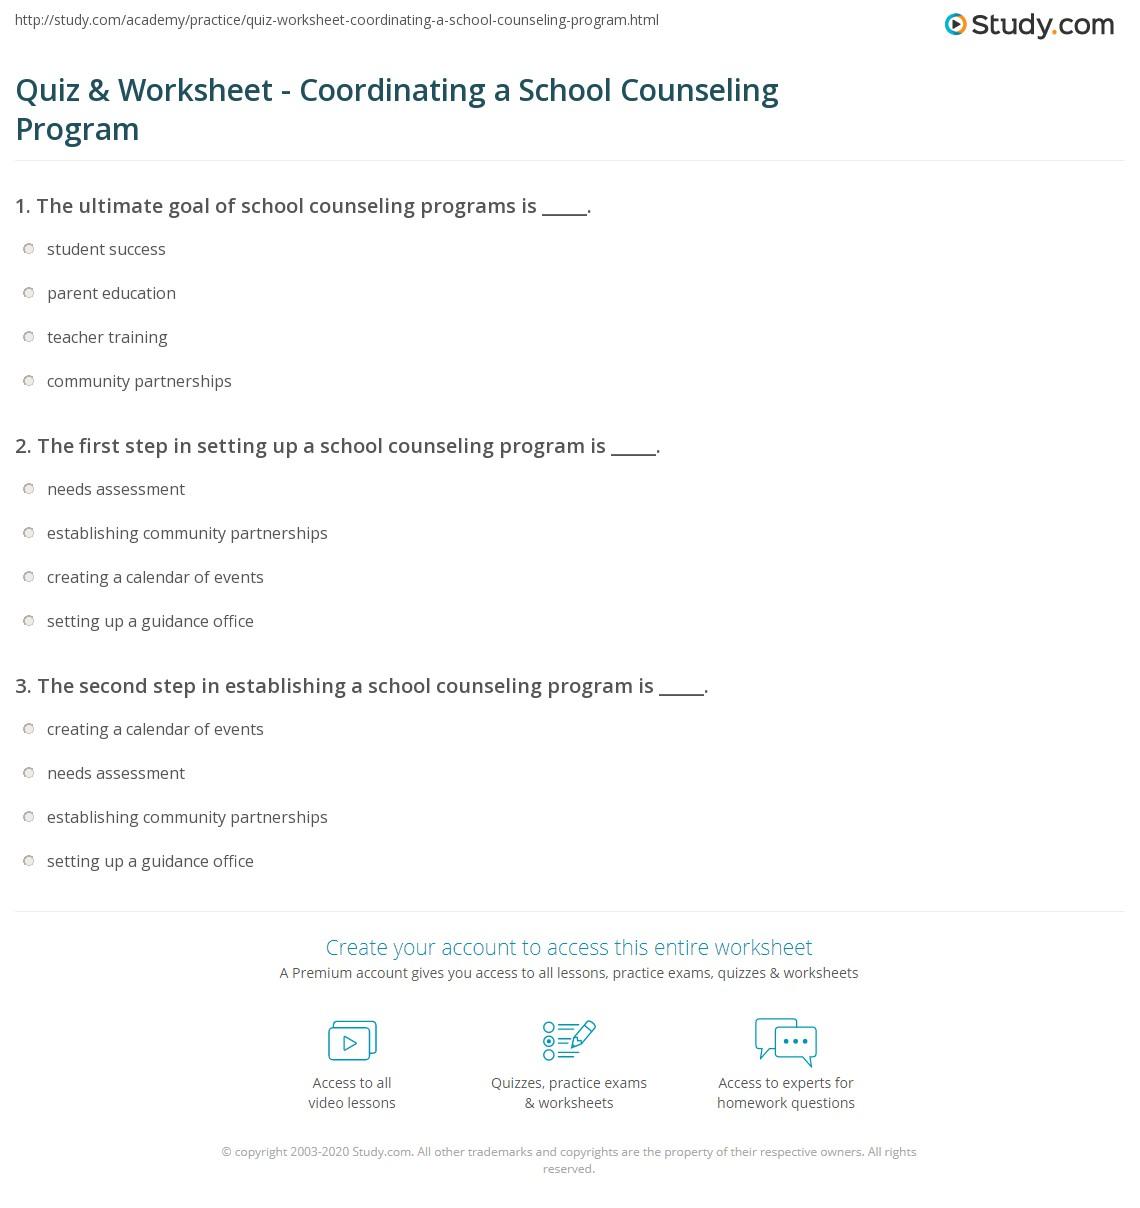 Quiz Worksheet Coordinating A School Counseling Program Study